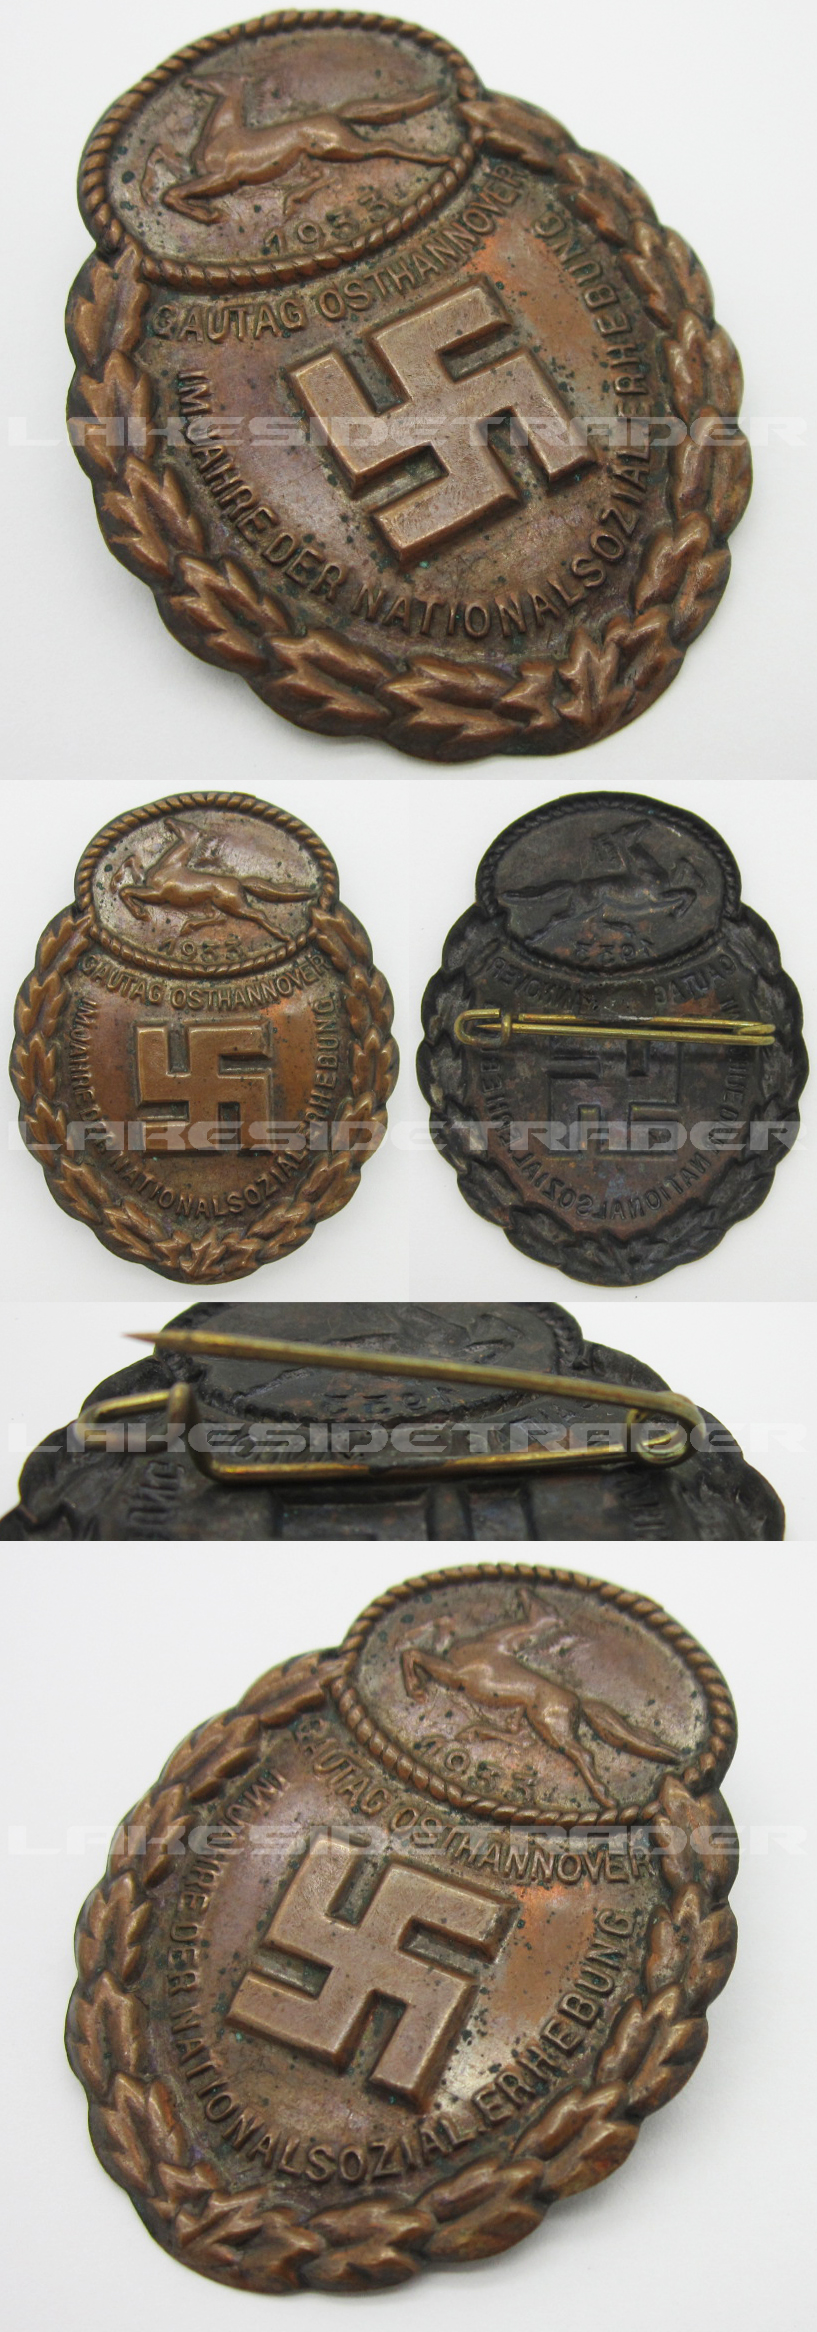 Gau East Hanover Commemorative Badge 1933